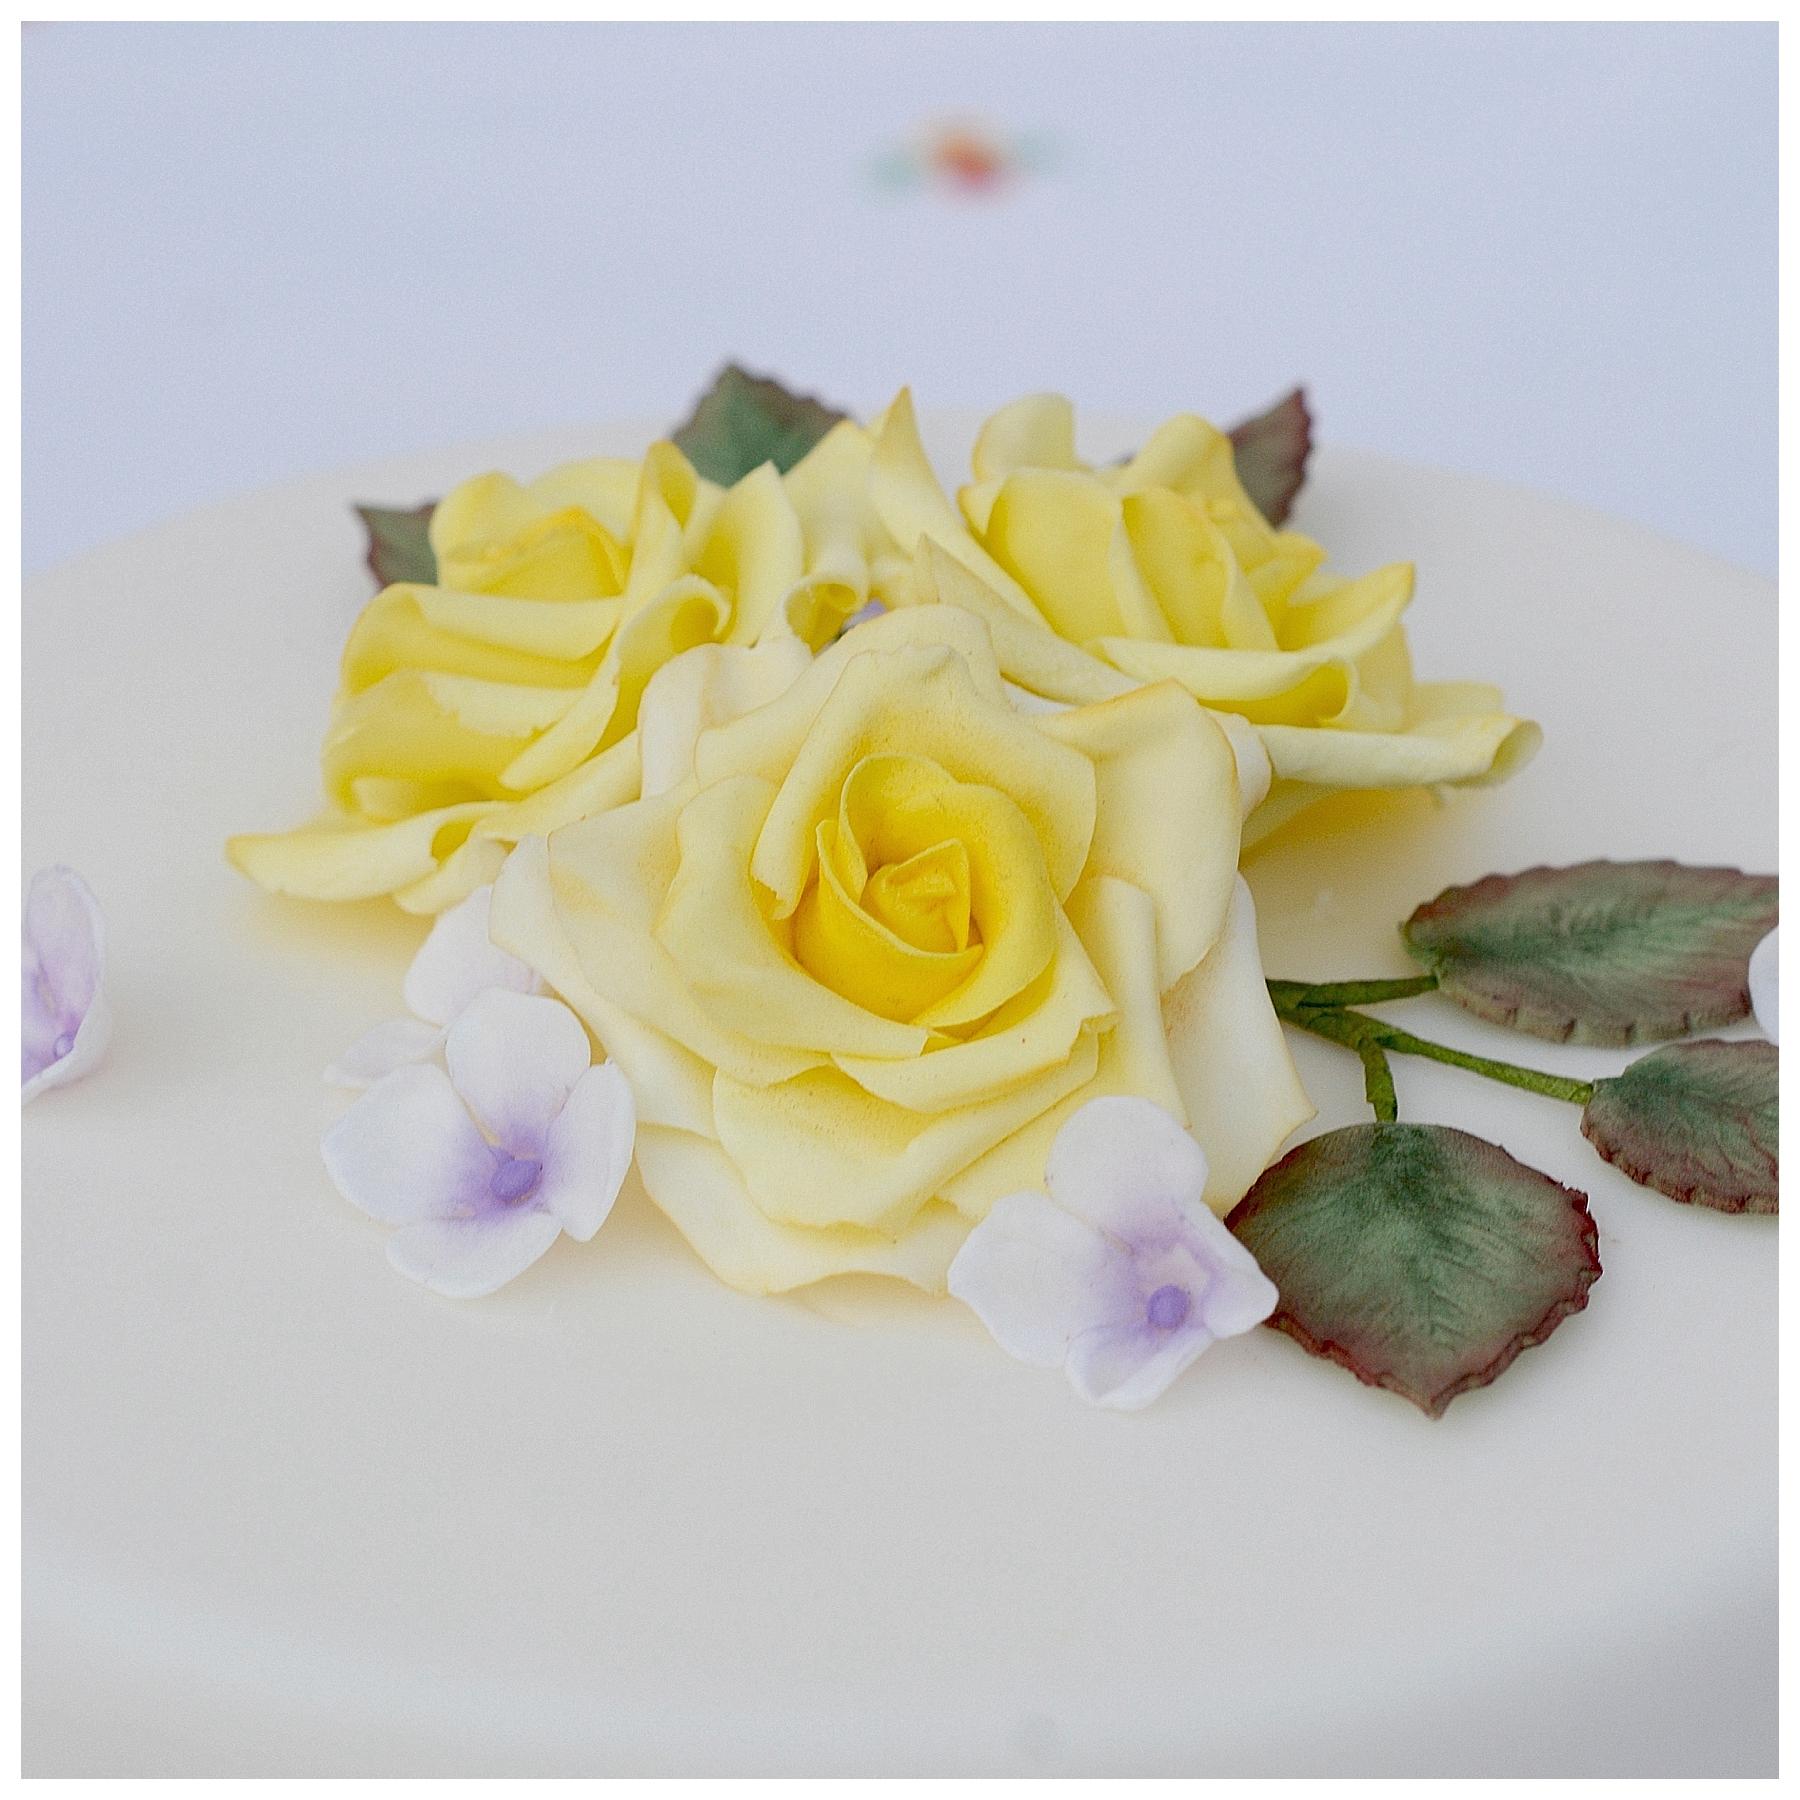 Torte Rosen Rosenblüte Blätter gelb